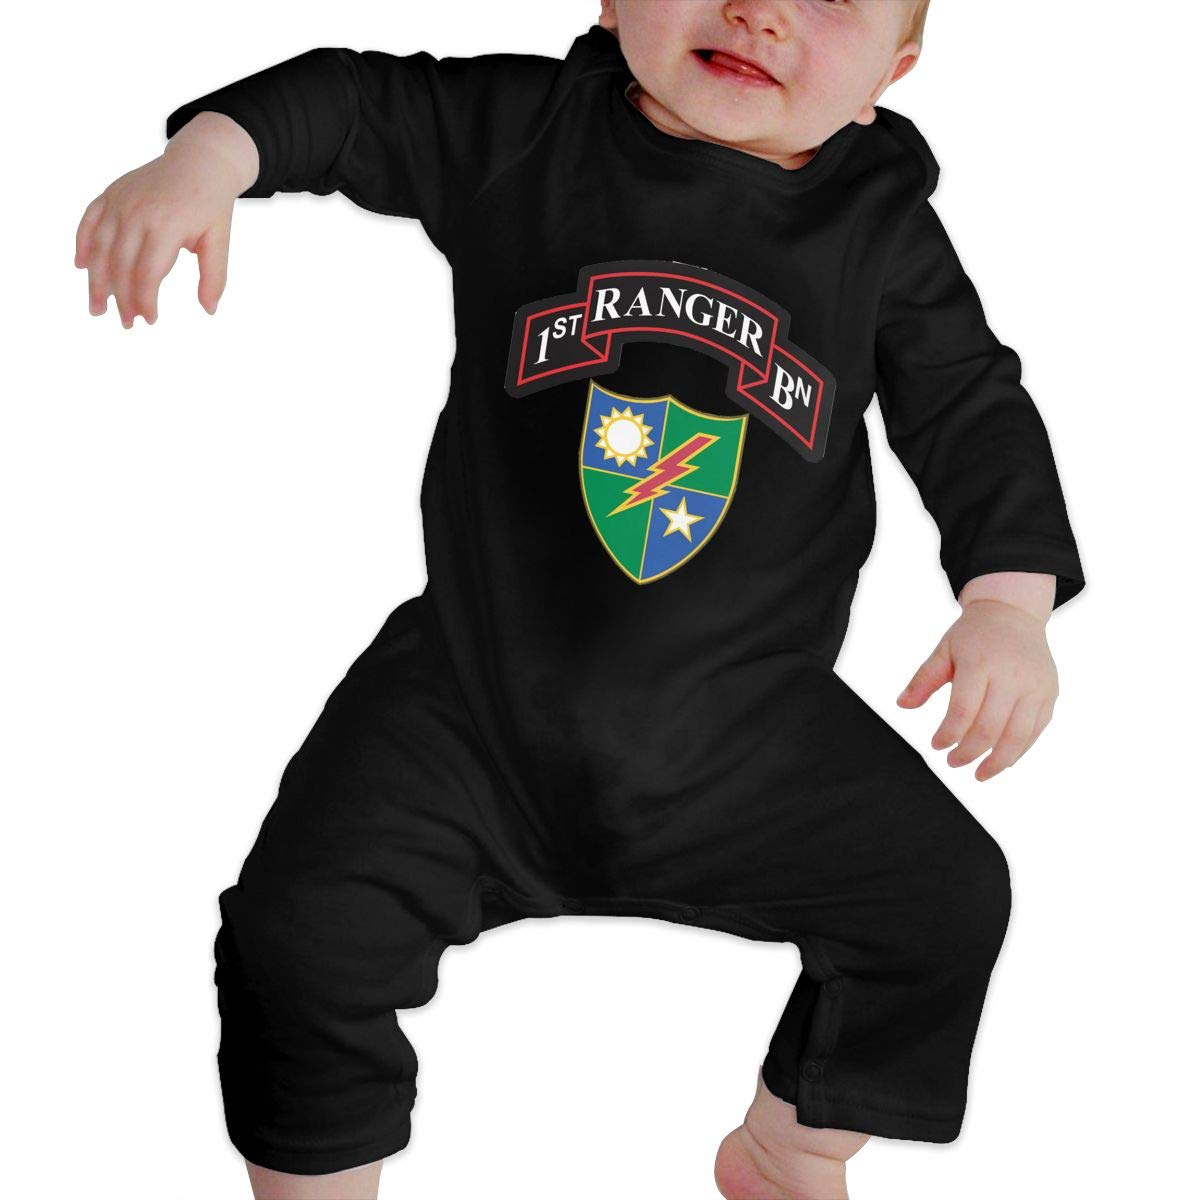 MiNgosRY 1st Battalion 75th Ranger Regiment Newborn Baby Long Sleeve Bodysuits Rompers Outfits